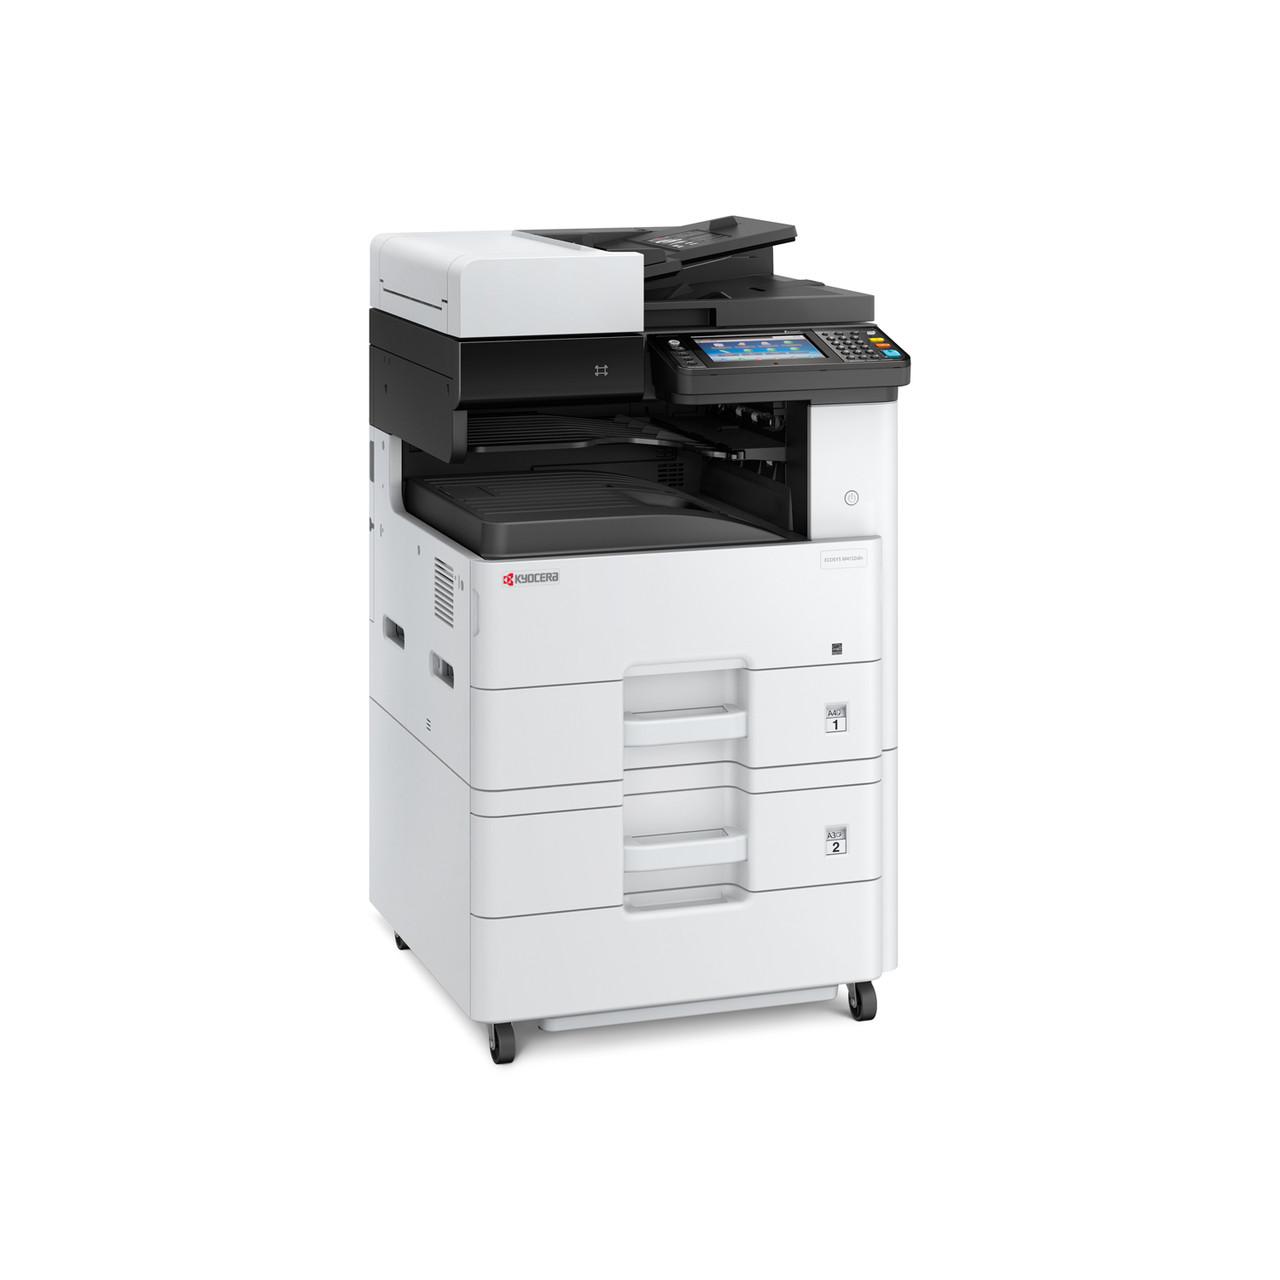 Лазерный копир-принтер-сканер Kyocera M4125idn